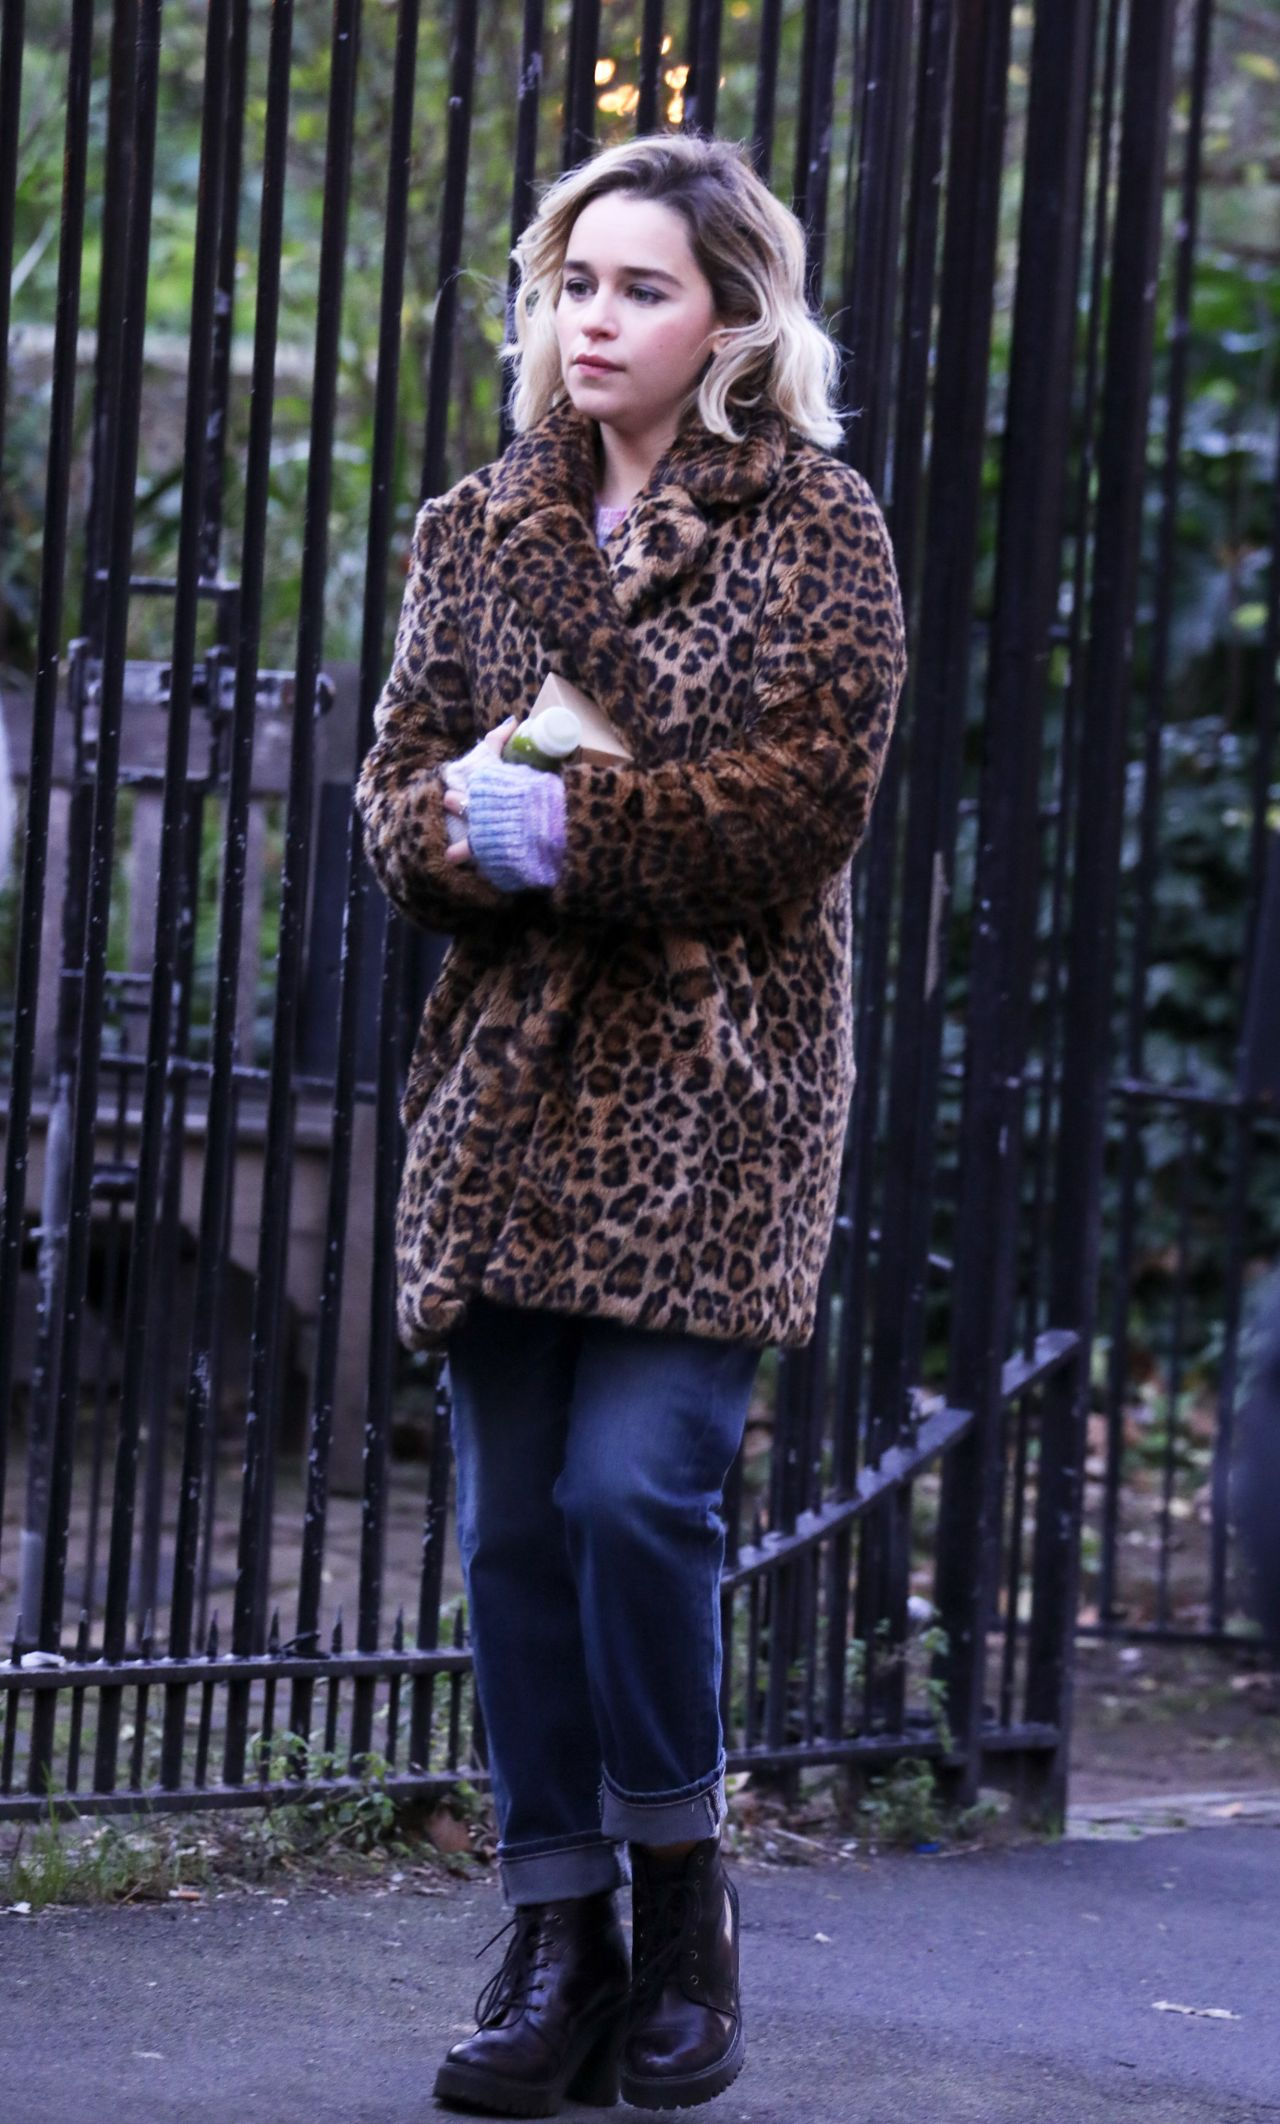 Last Christmas 2019.Emilia Clarke Last Christmas Filming In London 01 08 2019